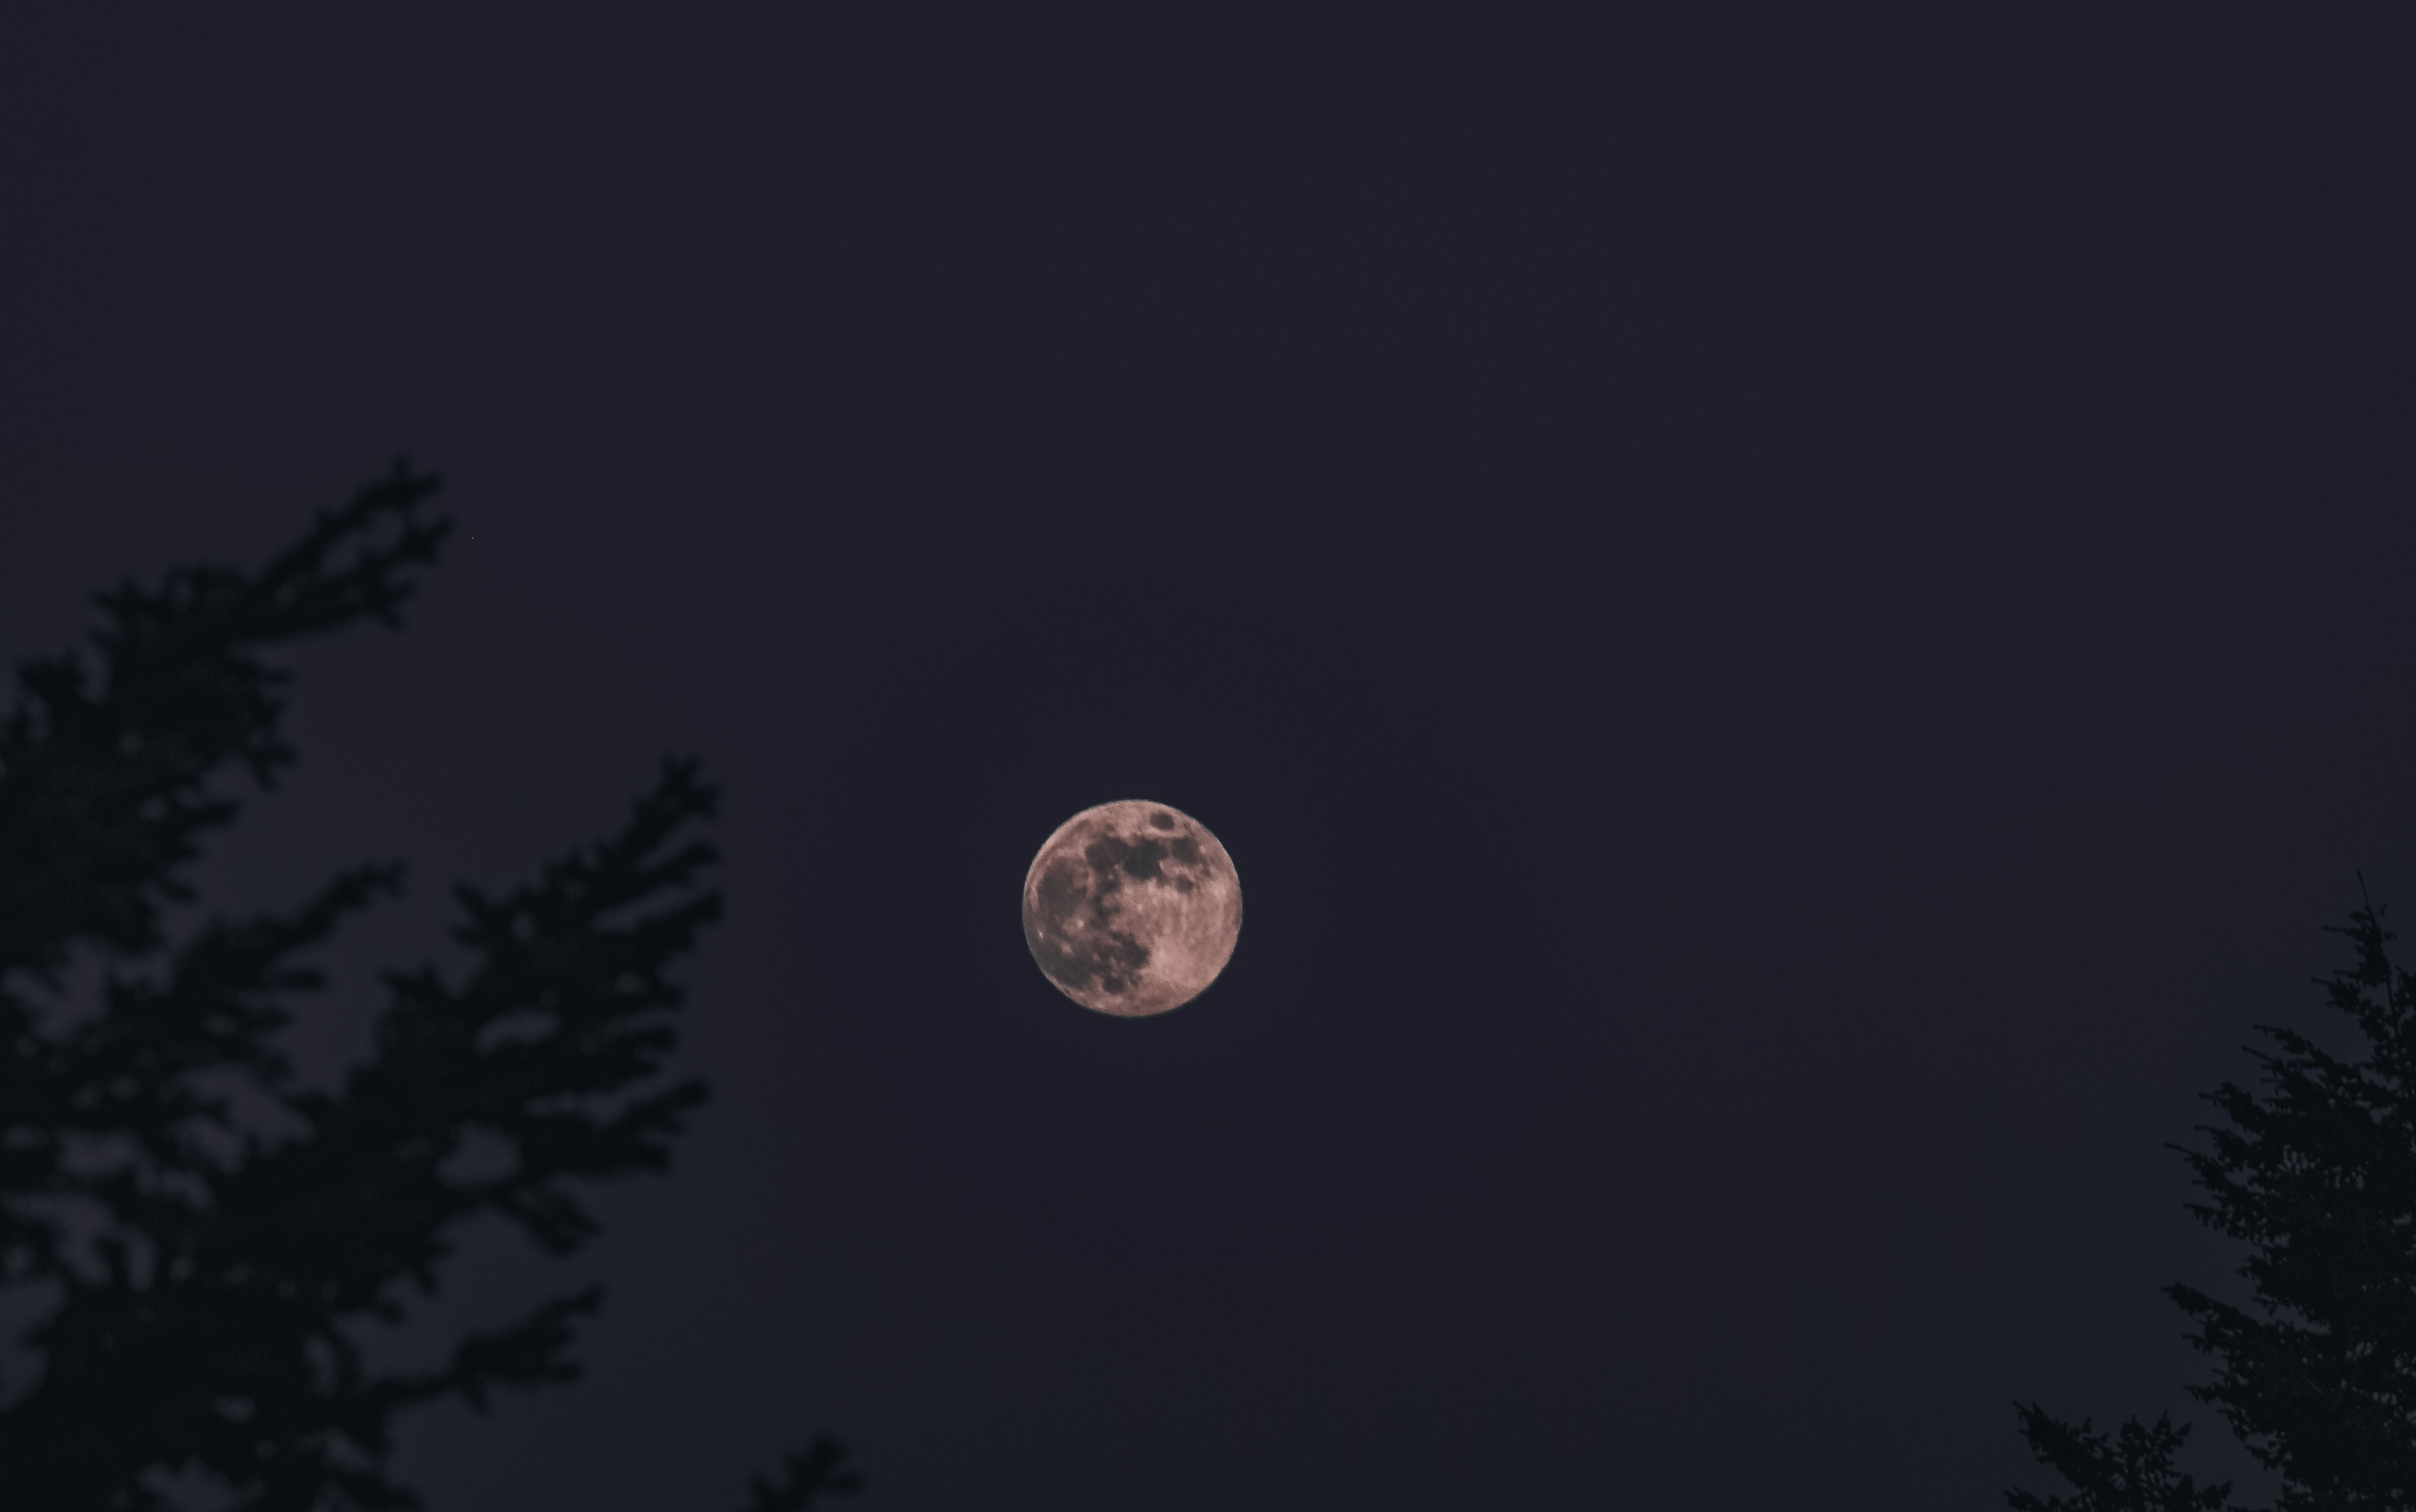 harvest-moon-in-night-sky_4460x4460